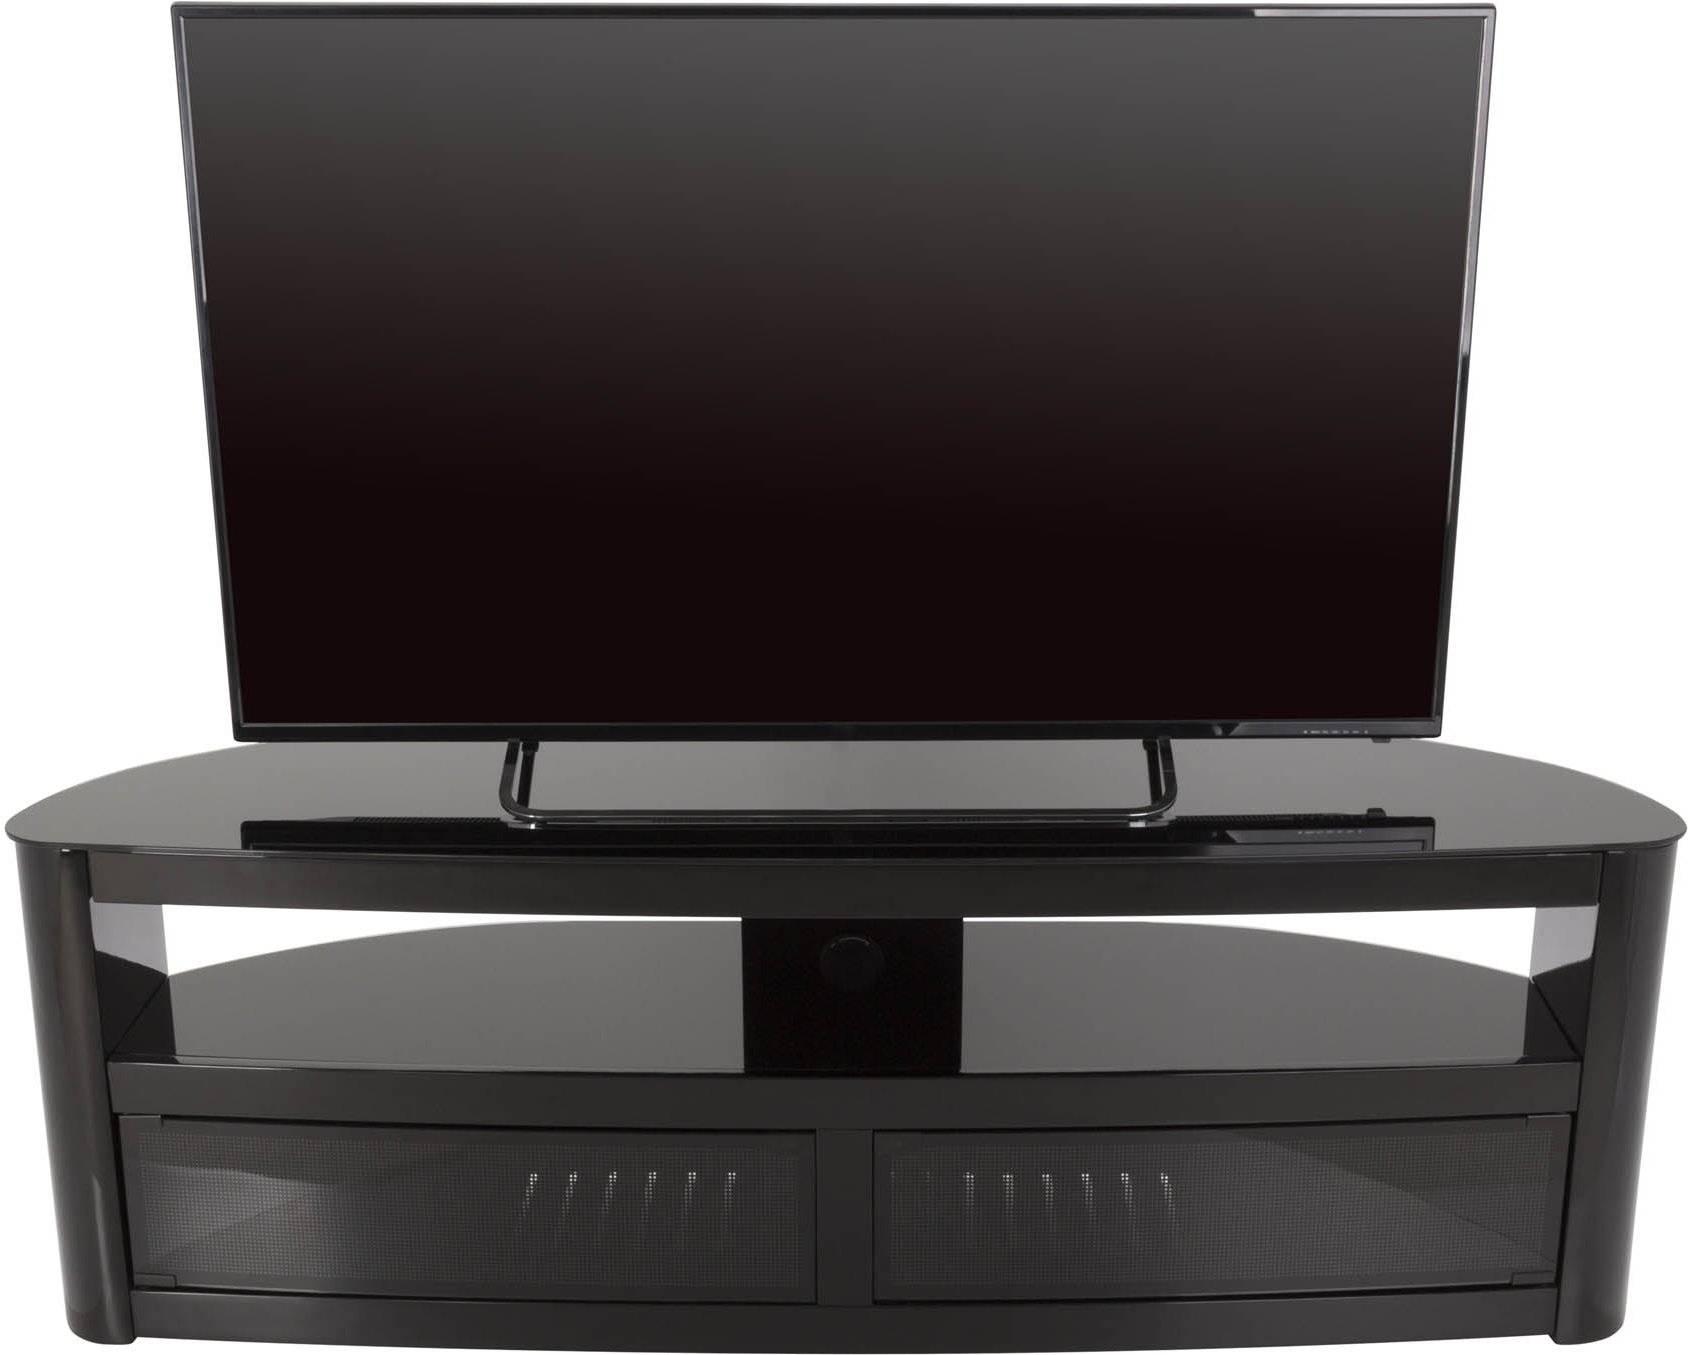 Avf Fs1500Burb Tv Stands regarding Black High Gloss Corner Tv Unit (Image 1 of 15)